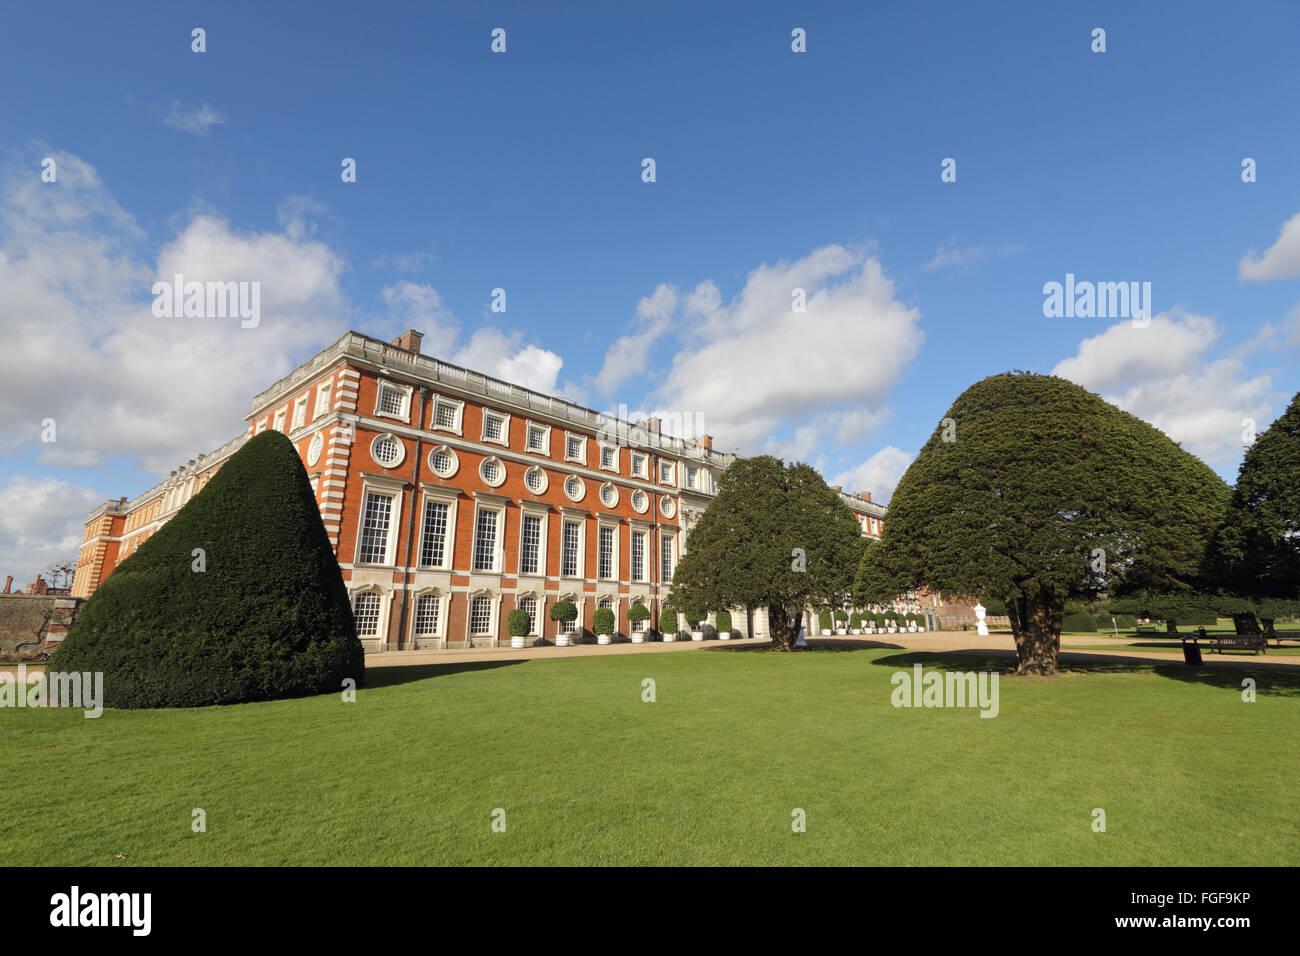 Hampton Court, SW London, England, UK  19th February 2016